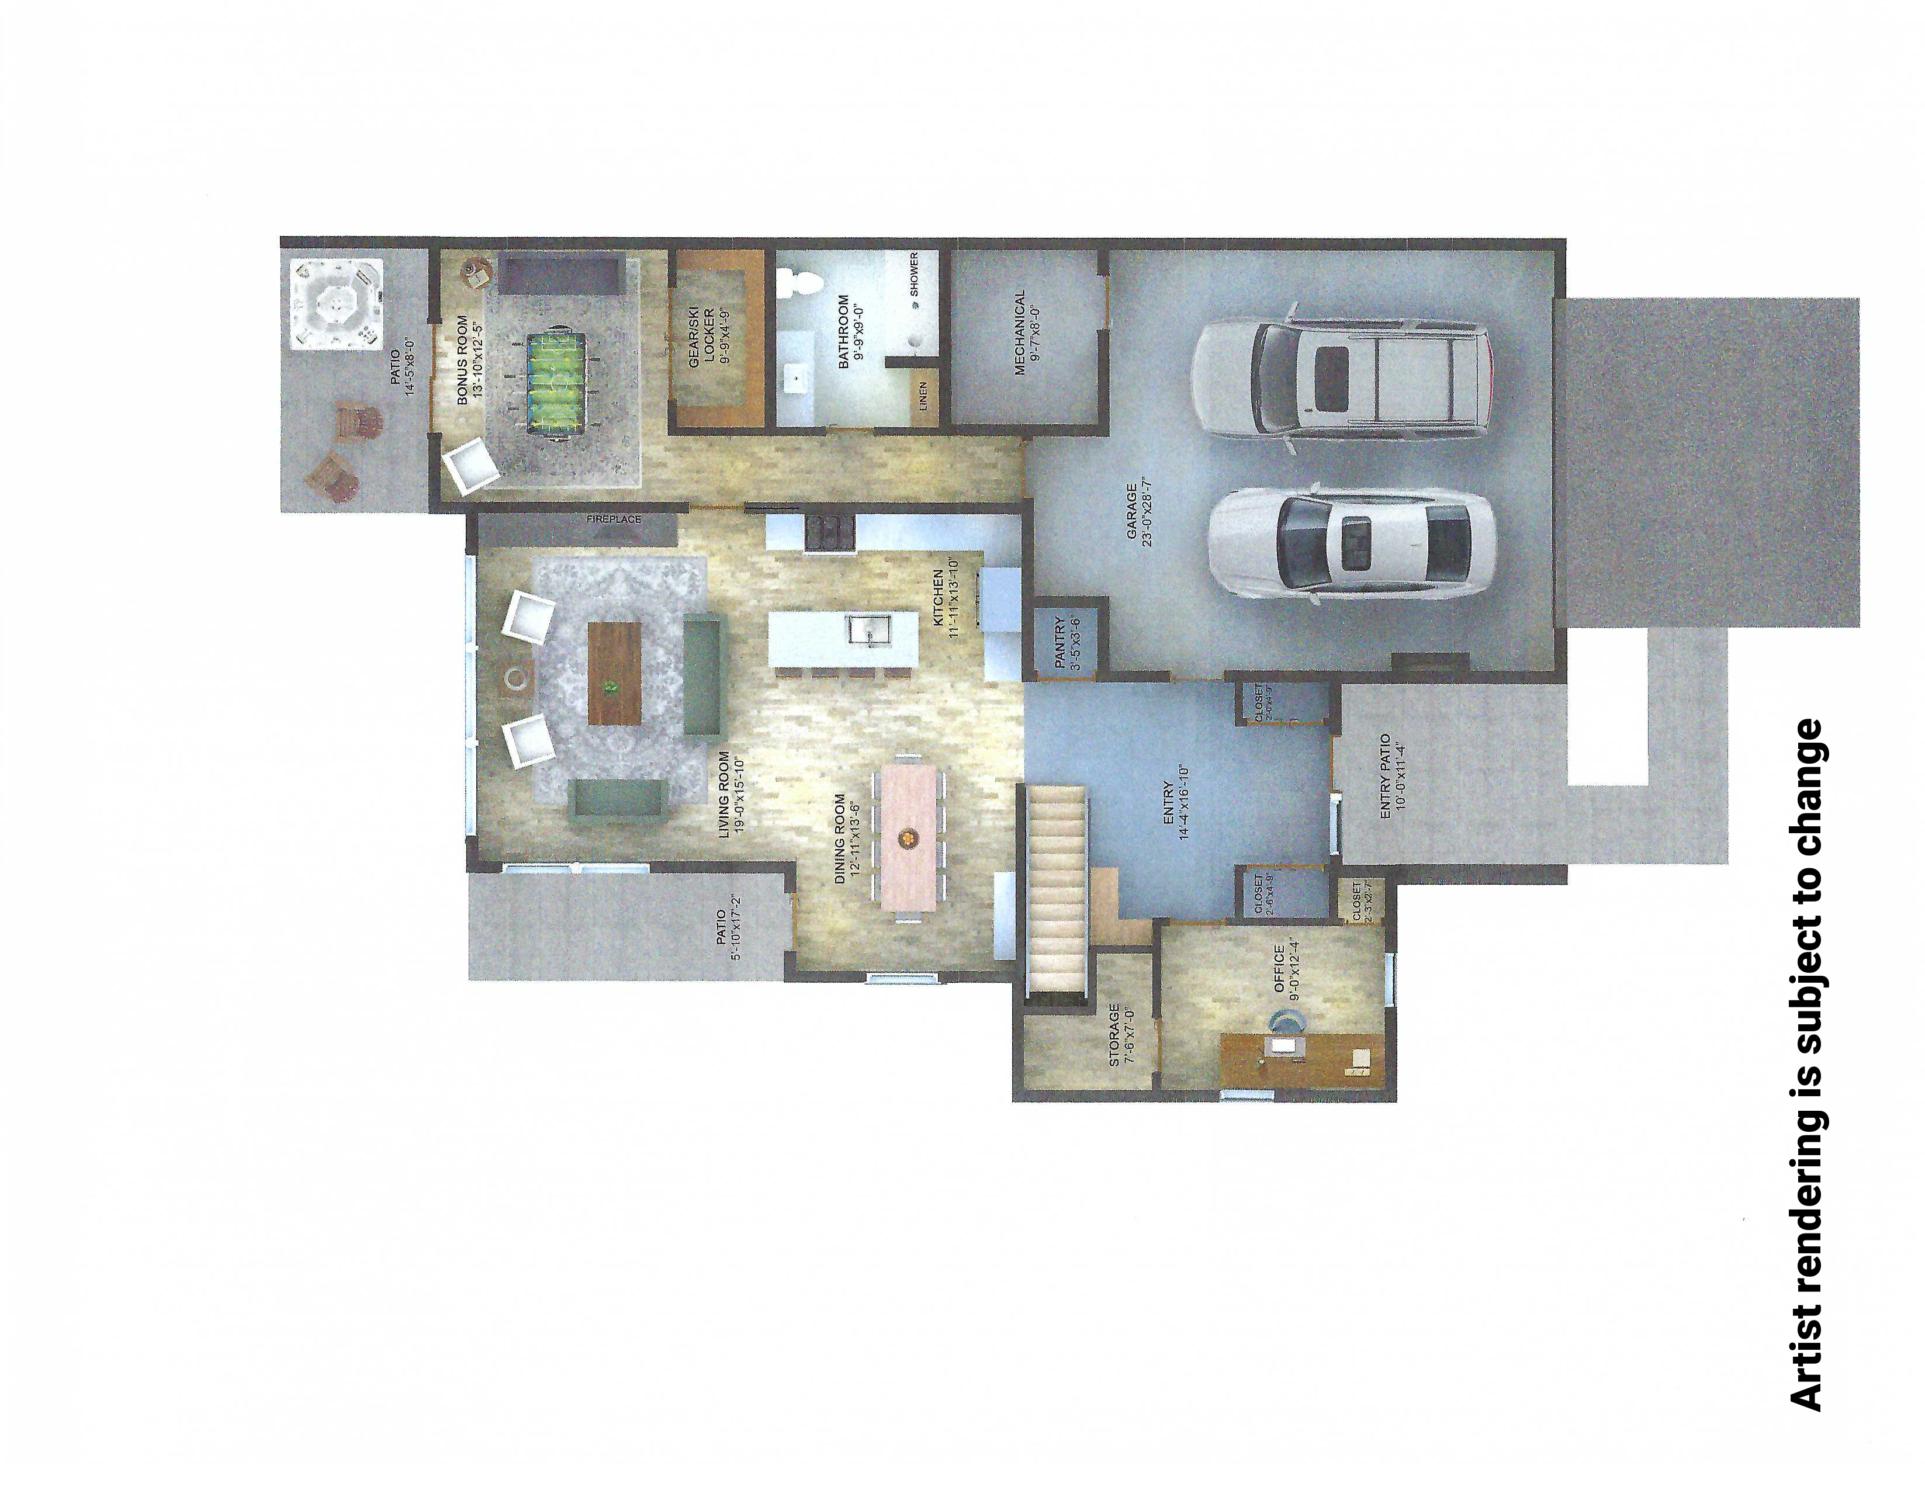 map1wdisclaimer